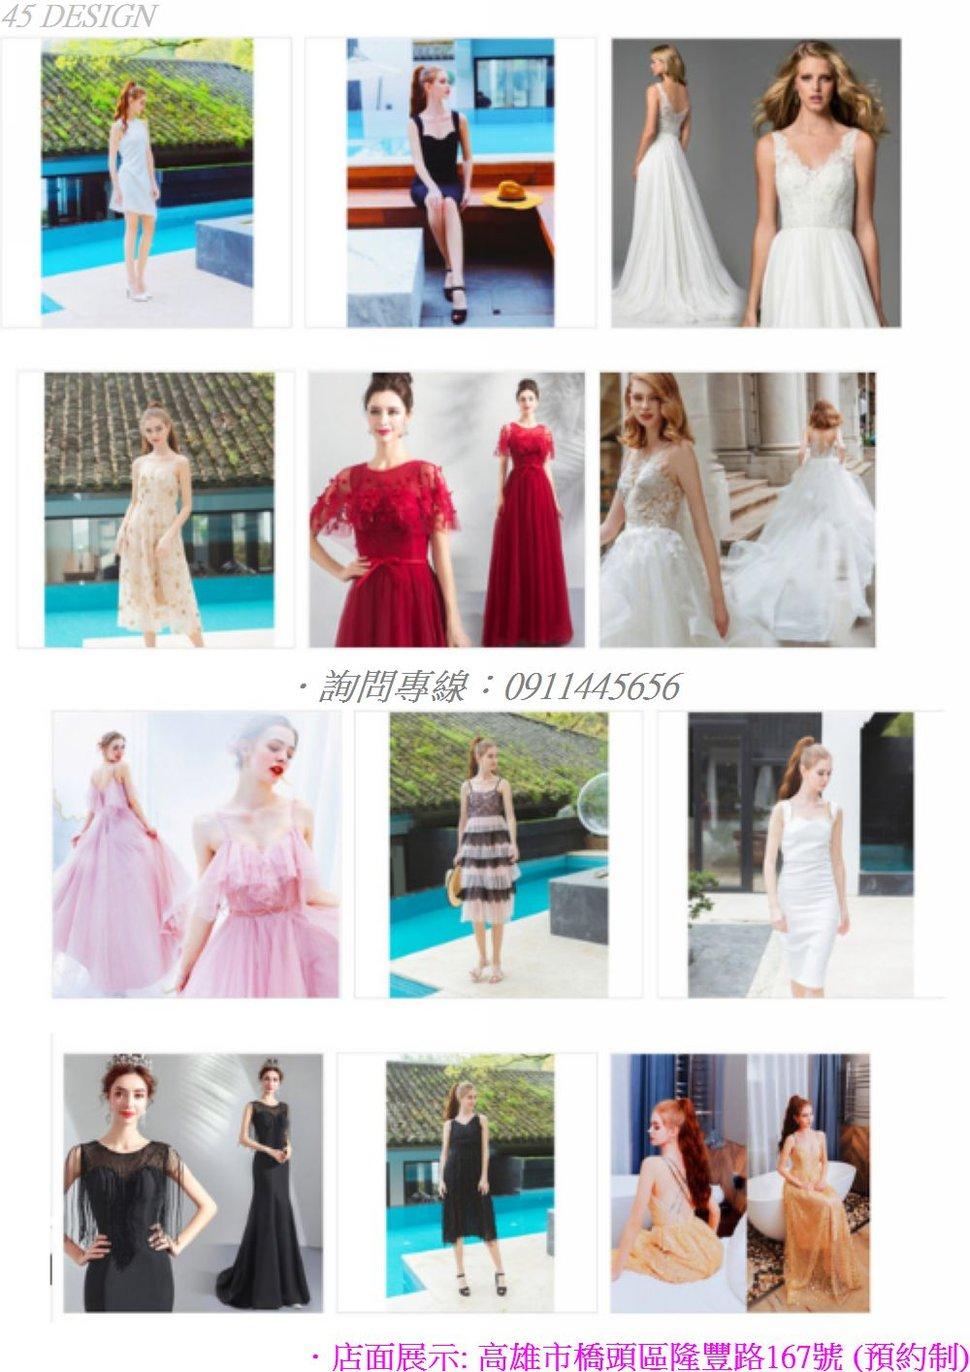 msl190815B2C89D6A278242FC9DCA6175C1815ABE - 全台最便宜-45DESIGN四五婚紗禮服《結婚吧》